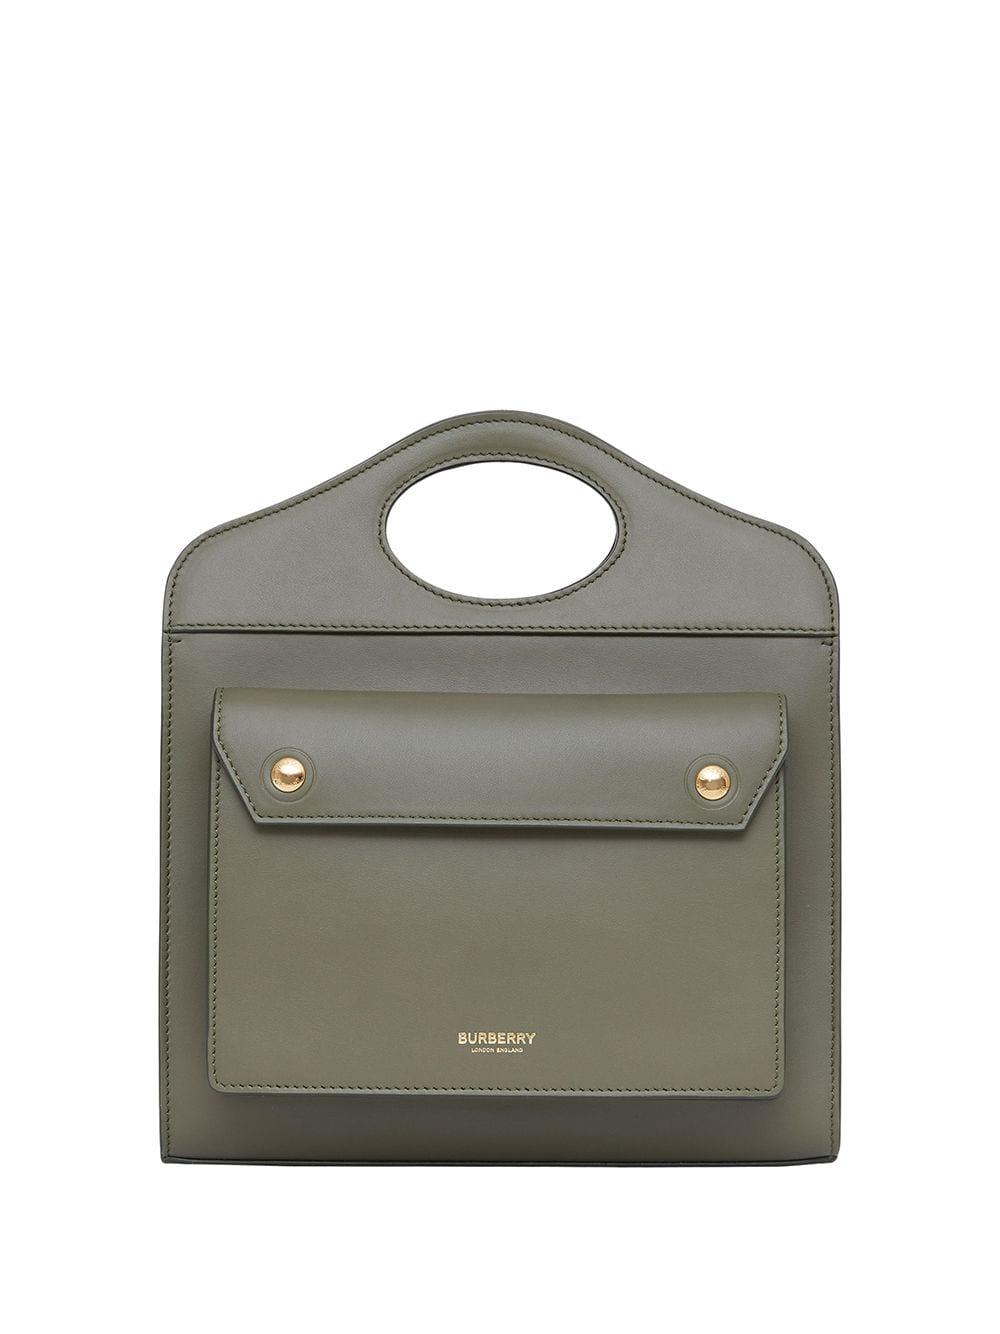 Burberry Mini Pocket Handtasche - Grün